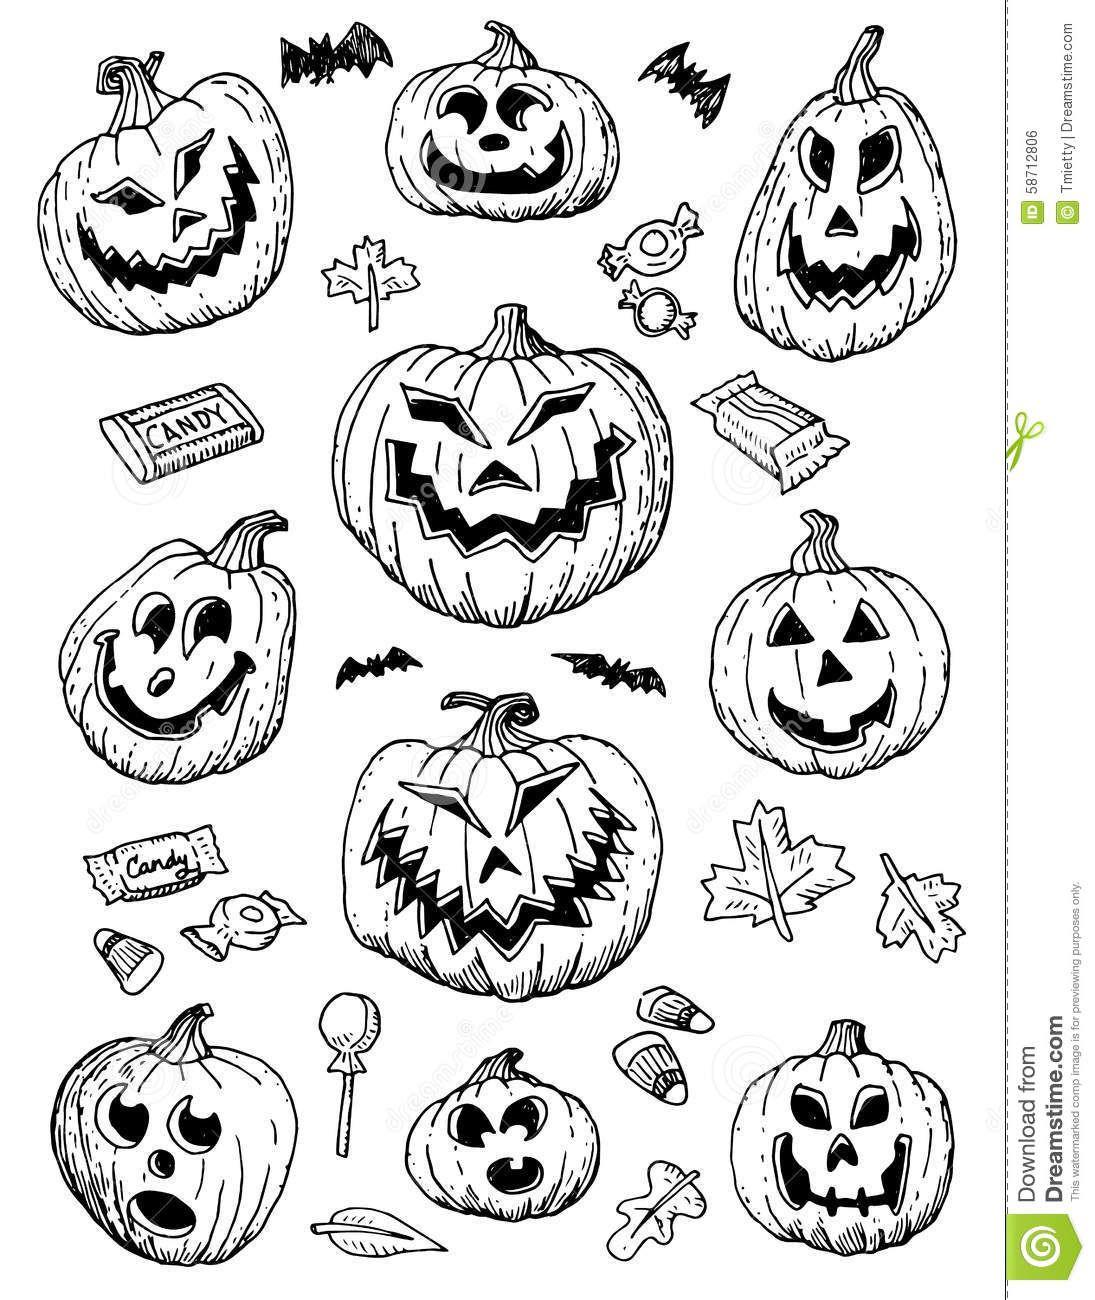 Image result for hand drawn halloween jack o lanterns